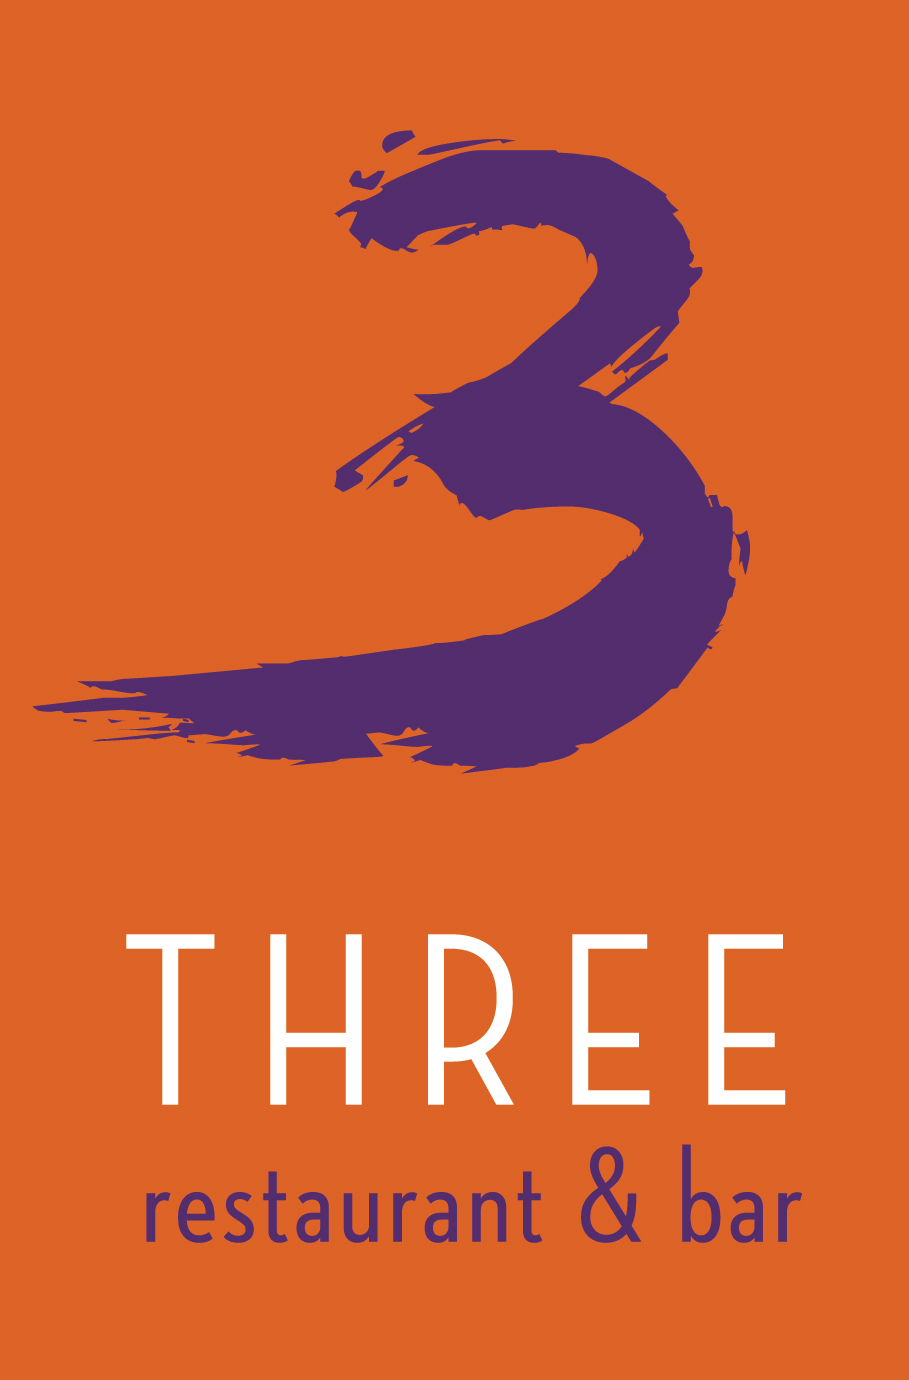 Three Restaurant